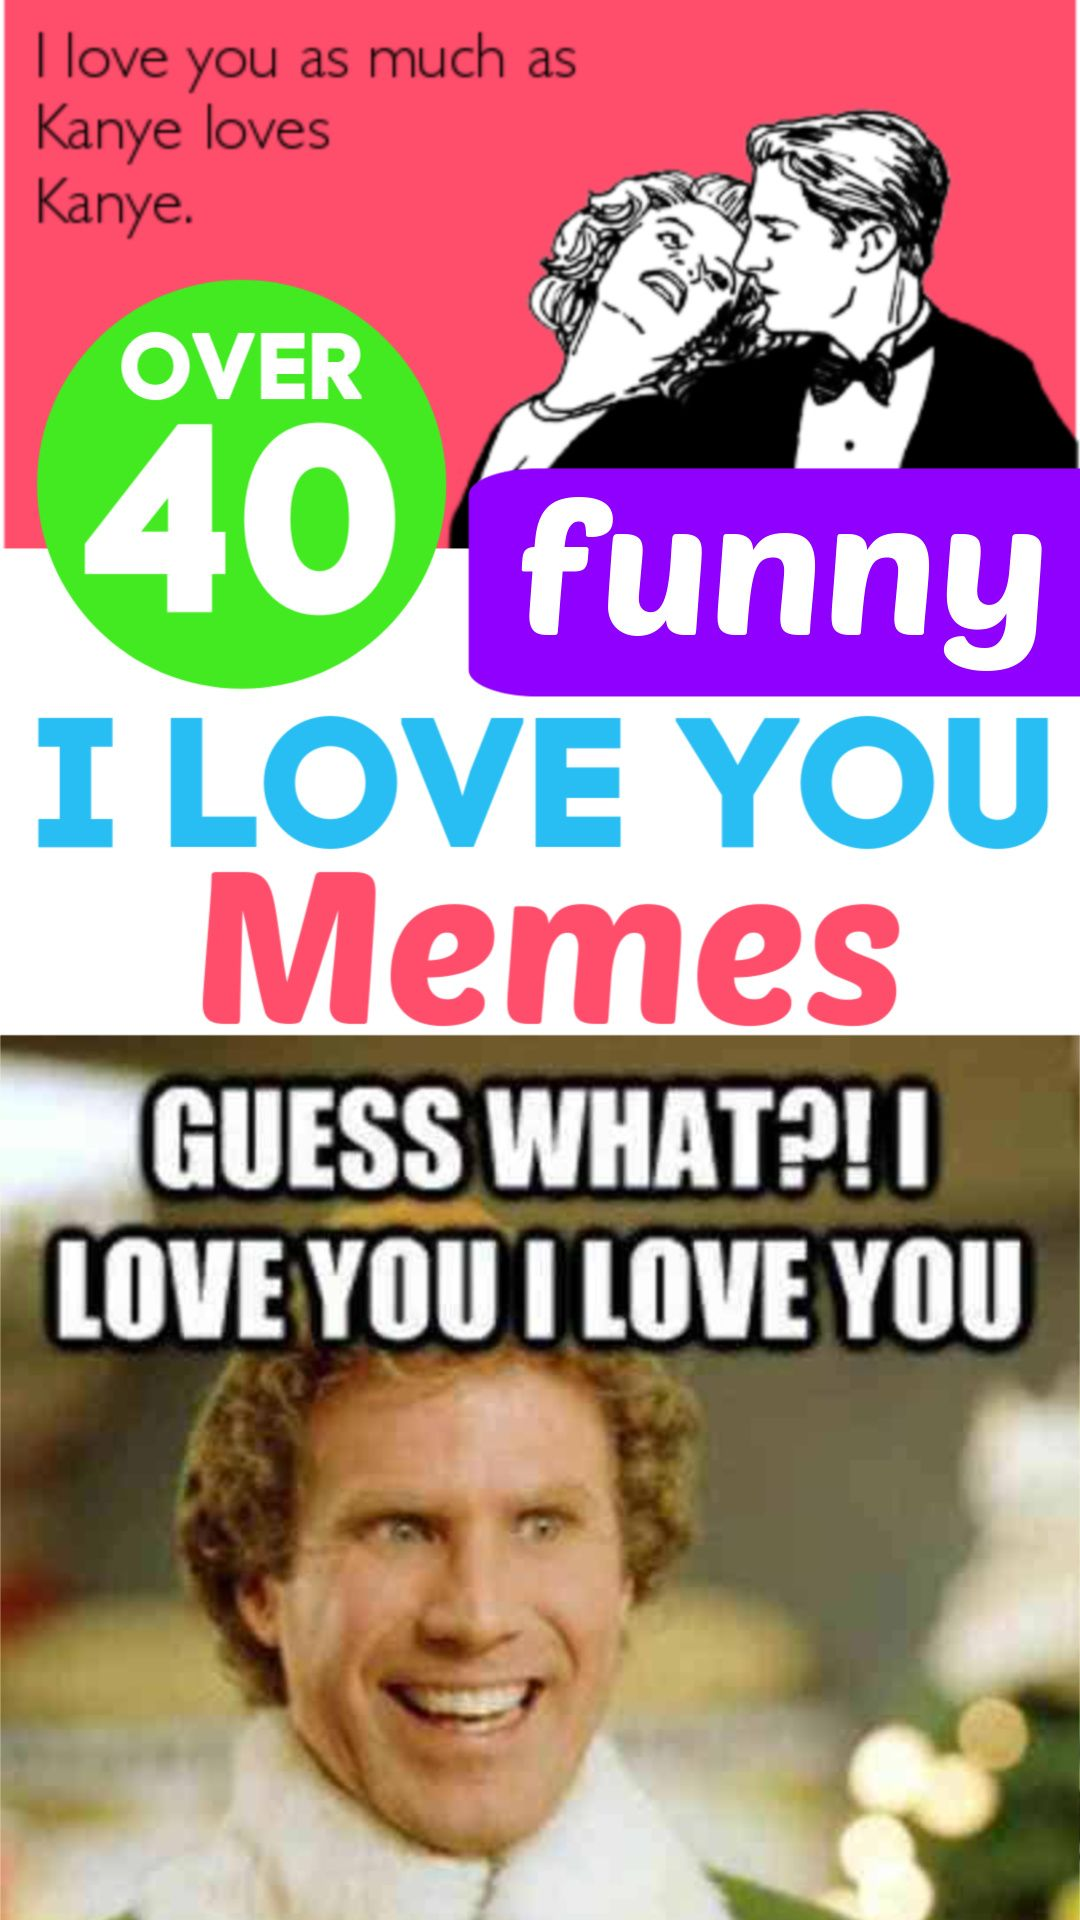 I Love You Memes For Him Funny : memes, funny, Funny, Memes, Meme,, Quotes, Husband,, Husband, Humor